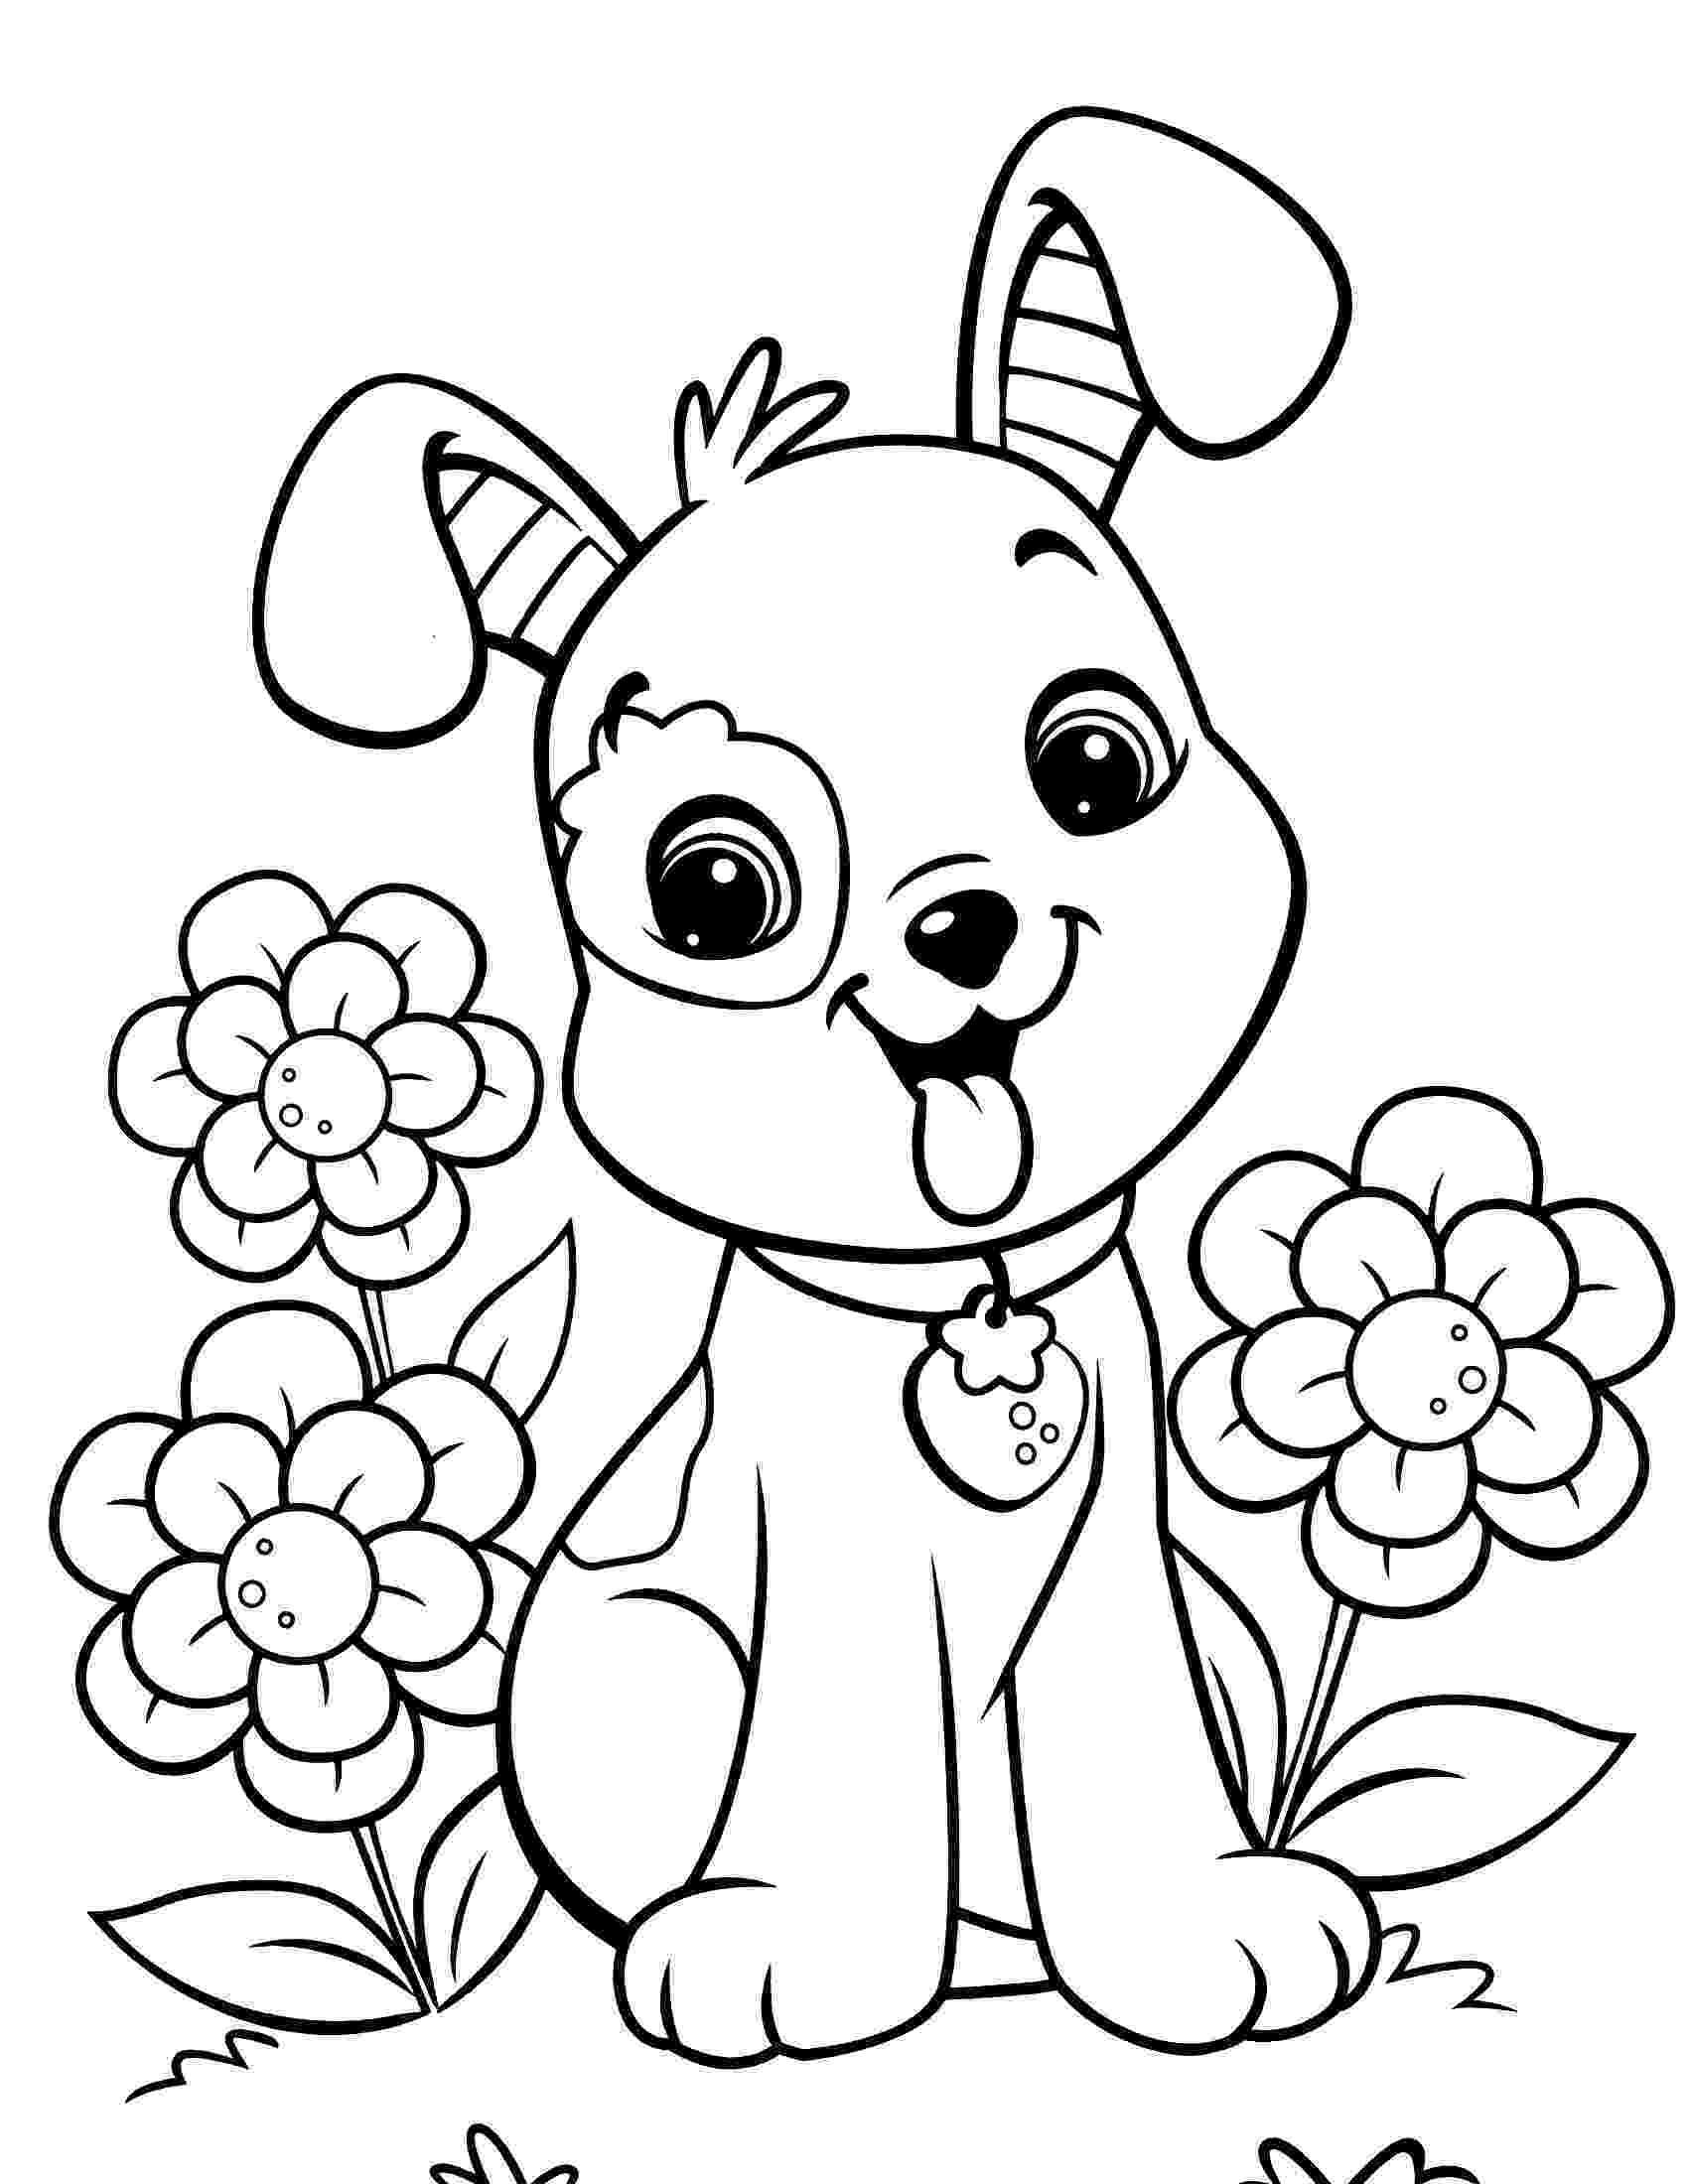 free dog coloring sheets free printable dog coloring pages for kids dog free coloring sheets